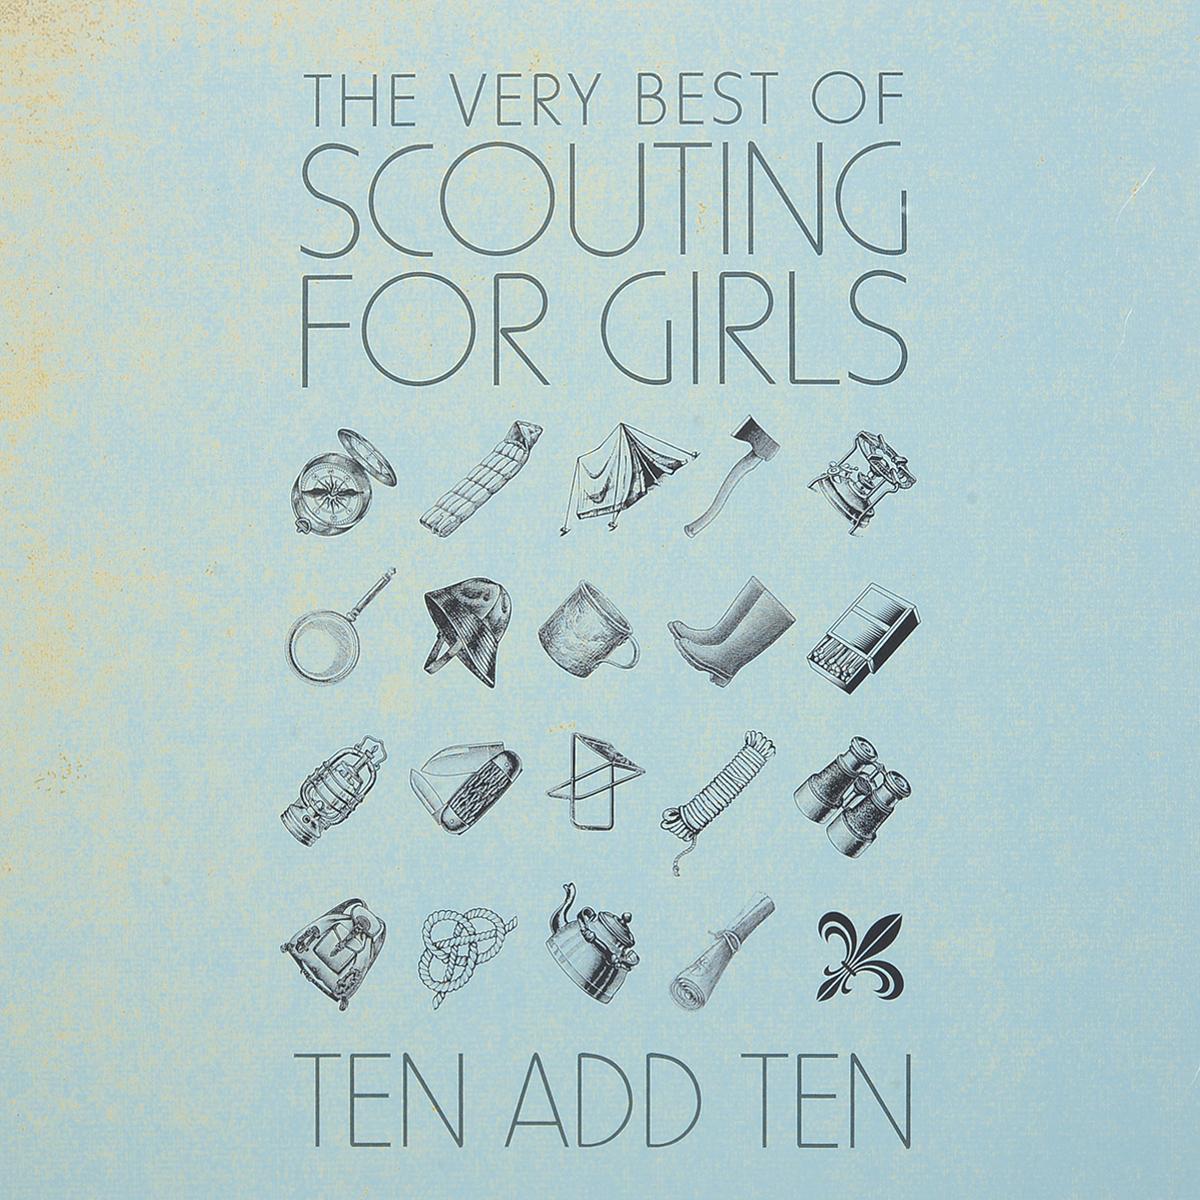 Scouting For Girls Scouting For Girls. Ten Add Ten: The Very Best Of Scouting For Girls (2 LP) girls at our best girls at our best pleasure